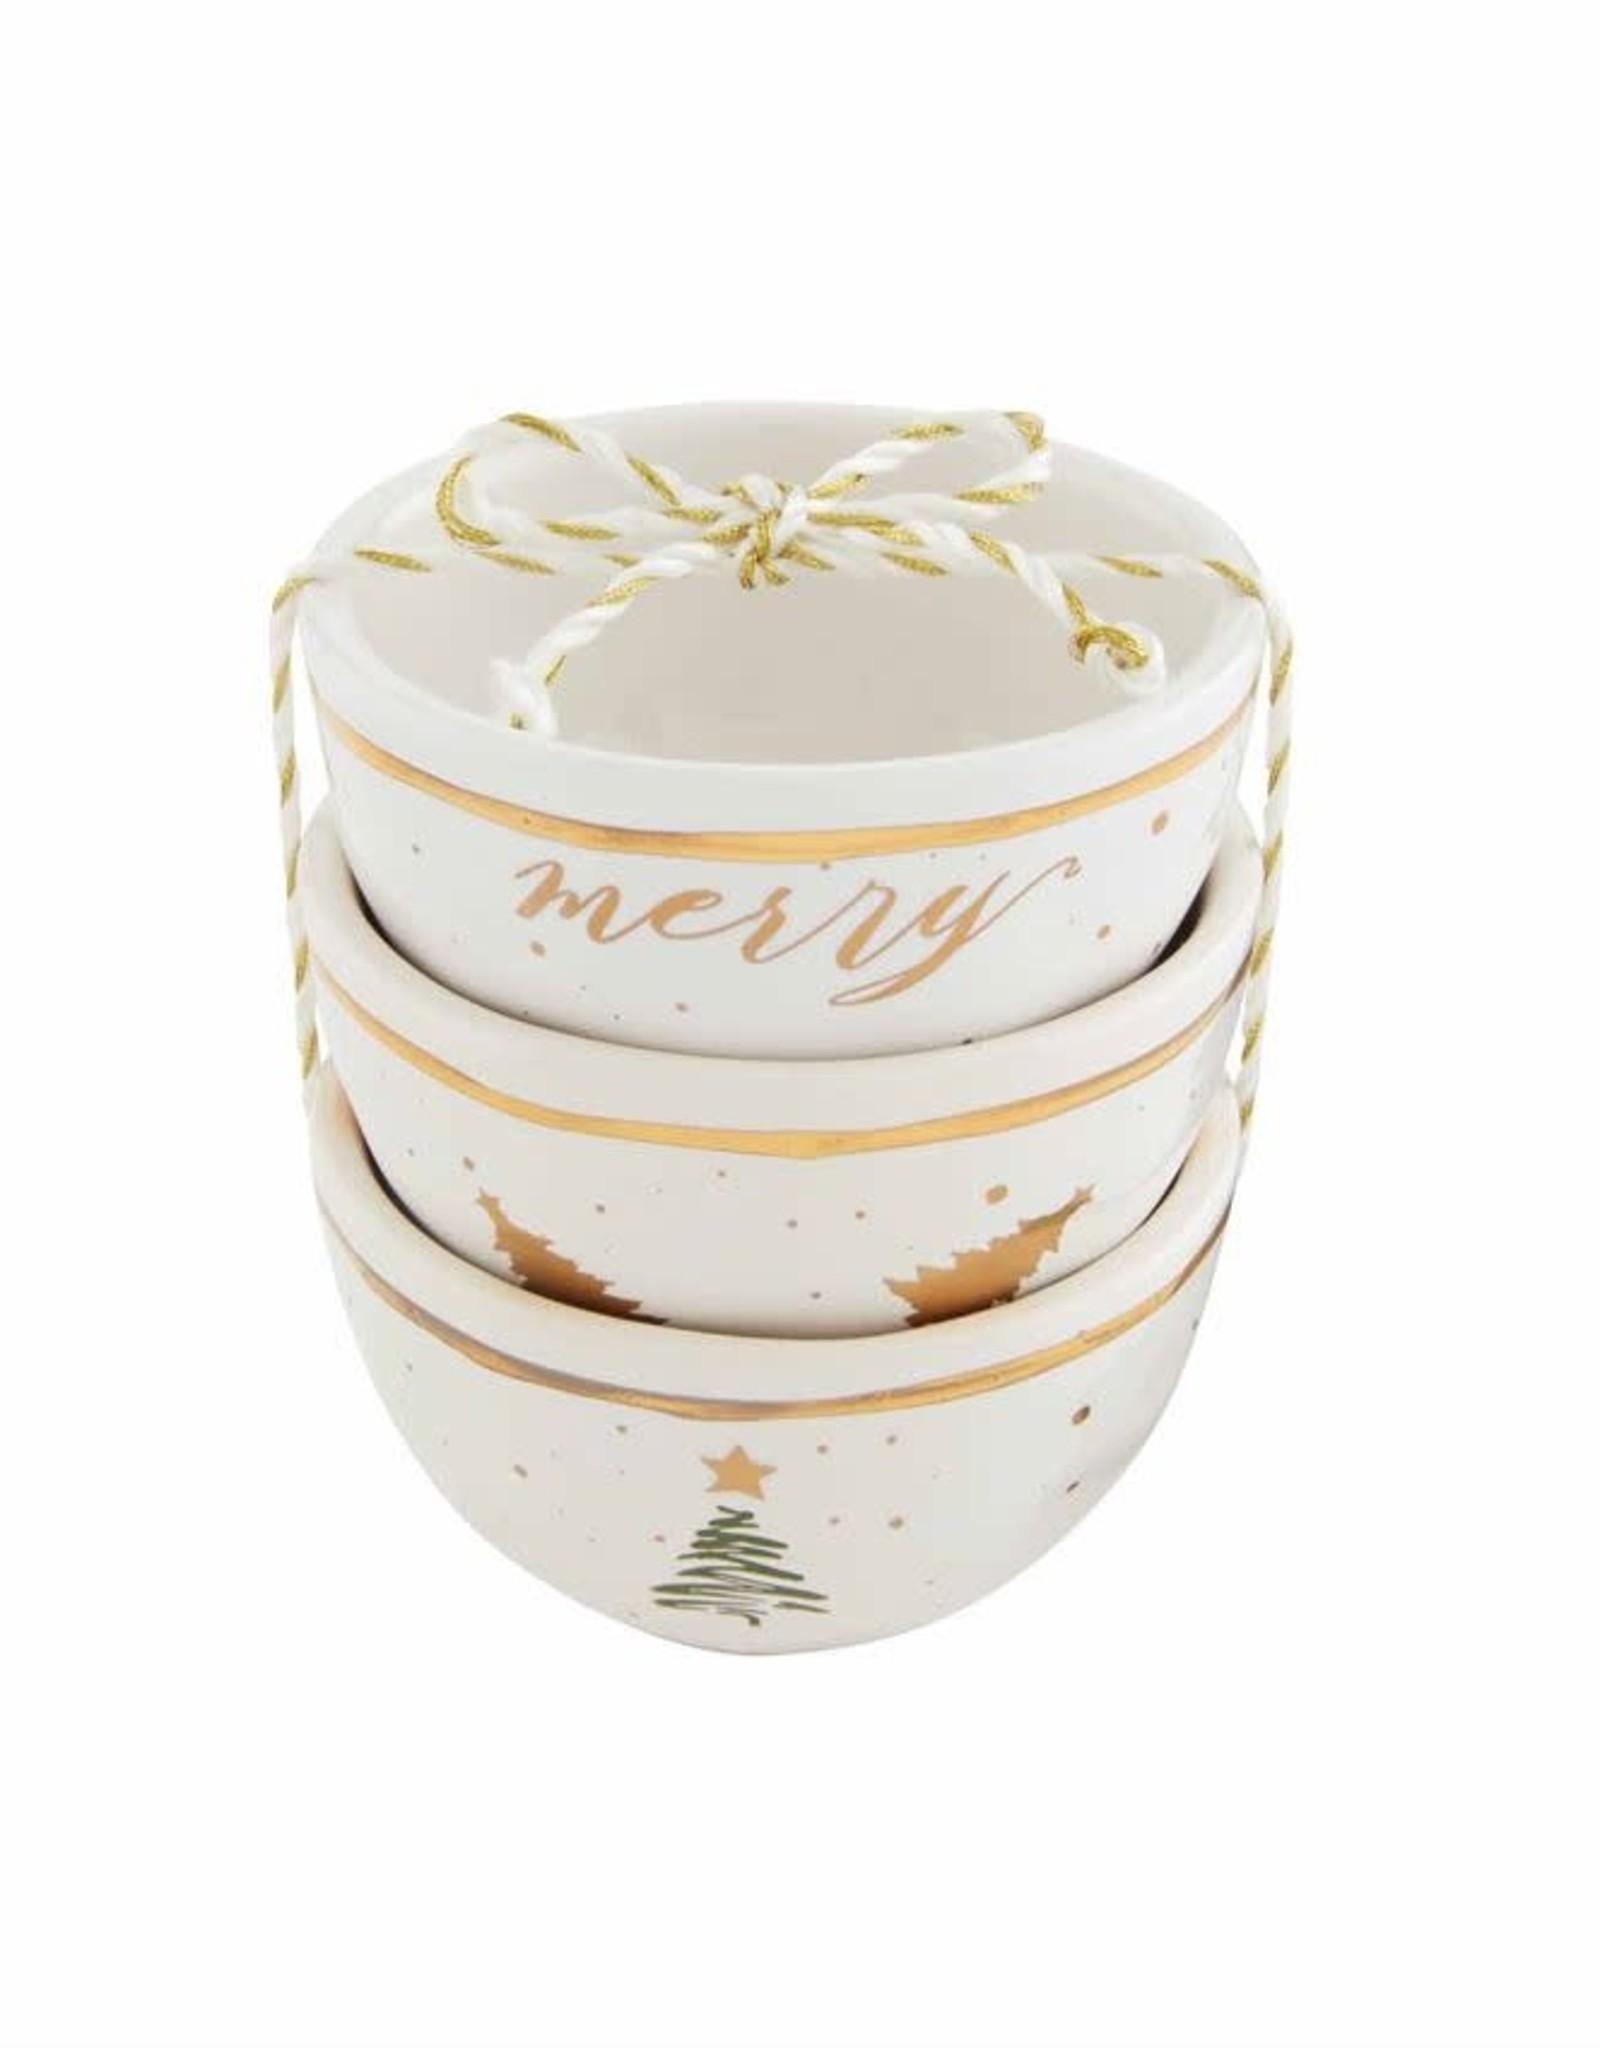 Holiday Christmas Dip Cup Set